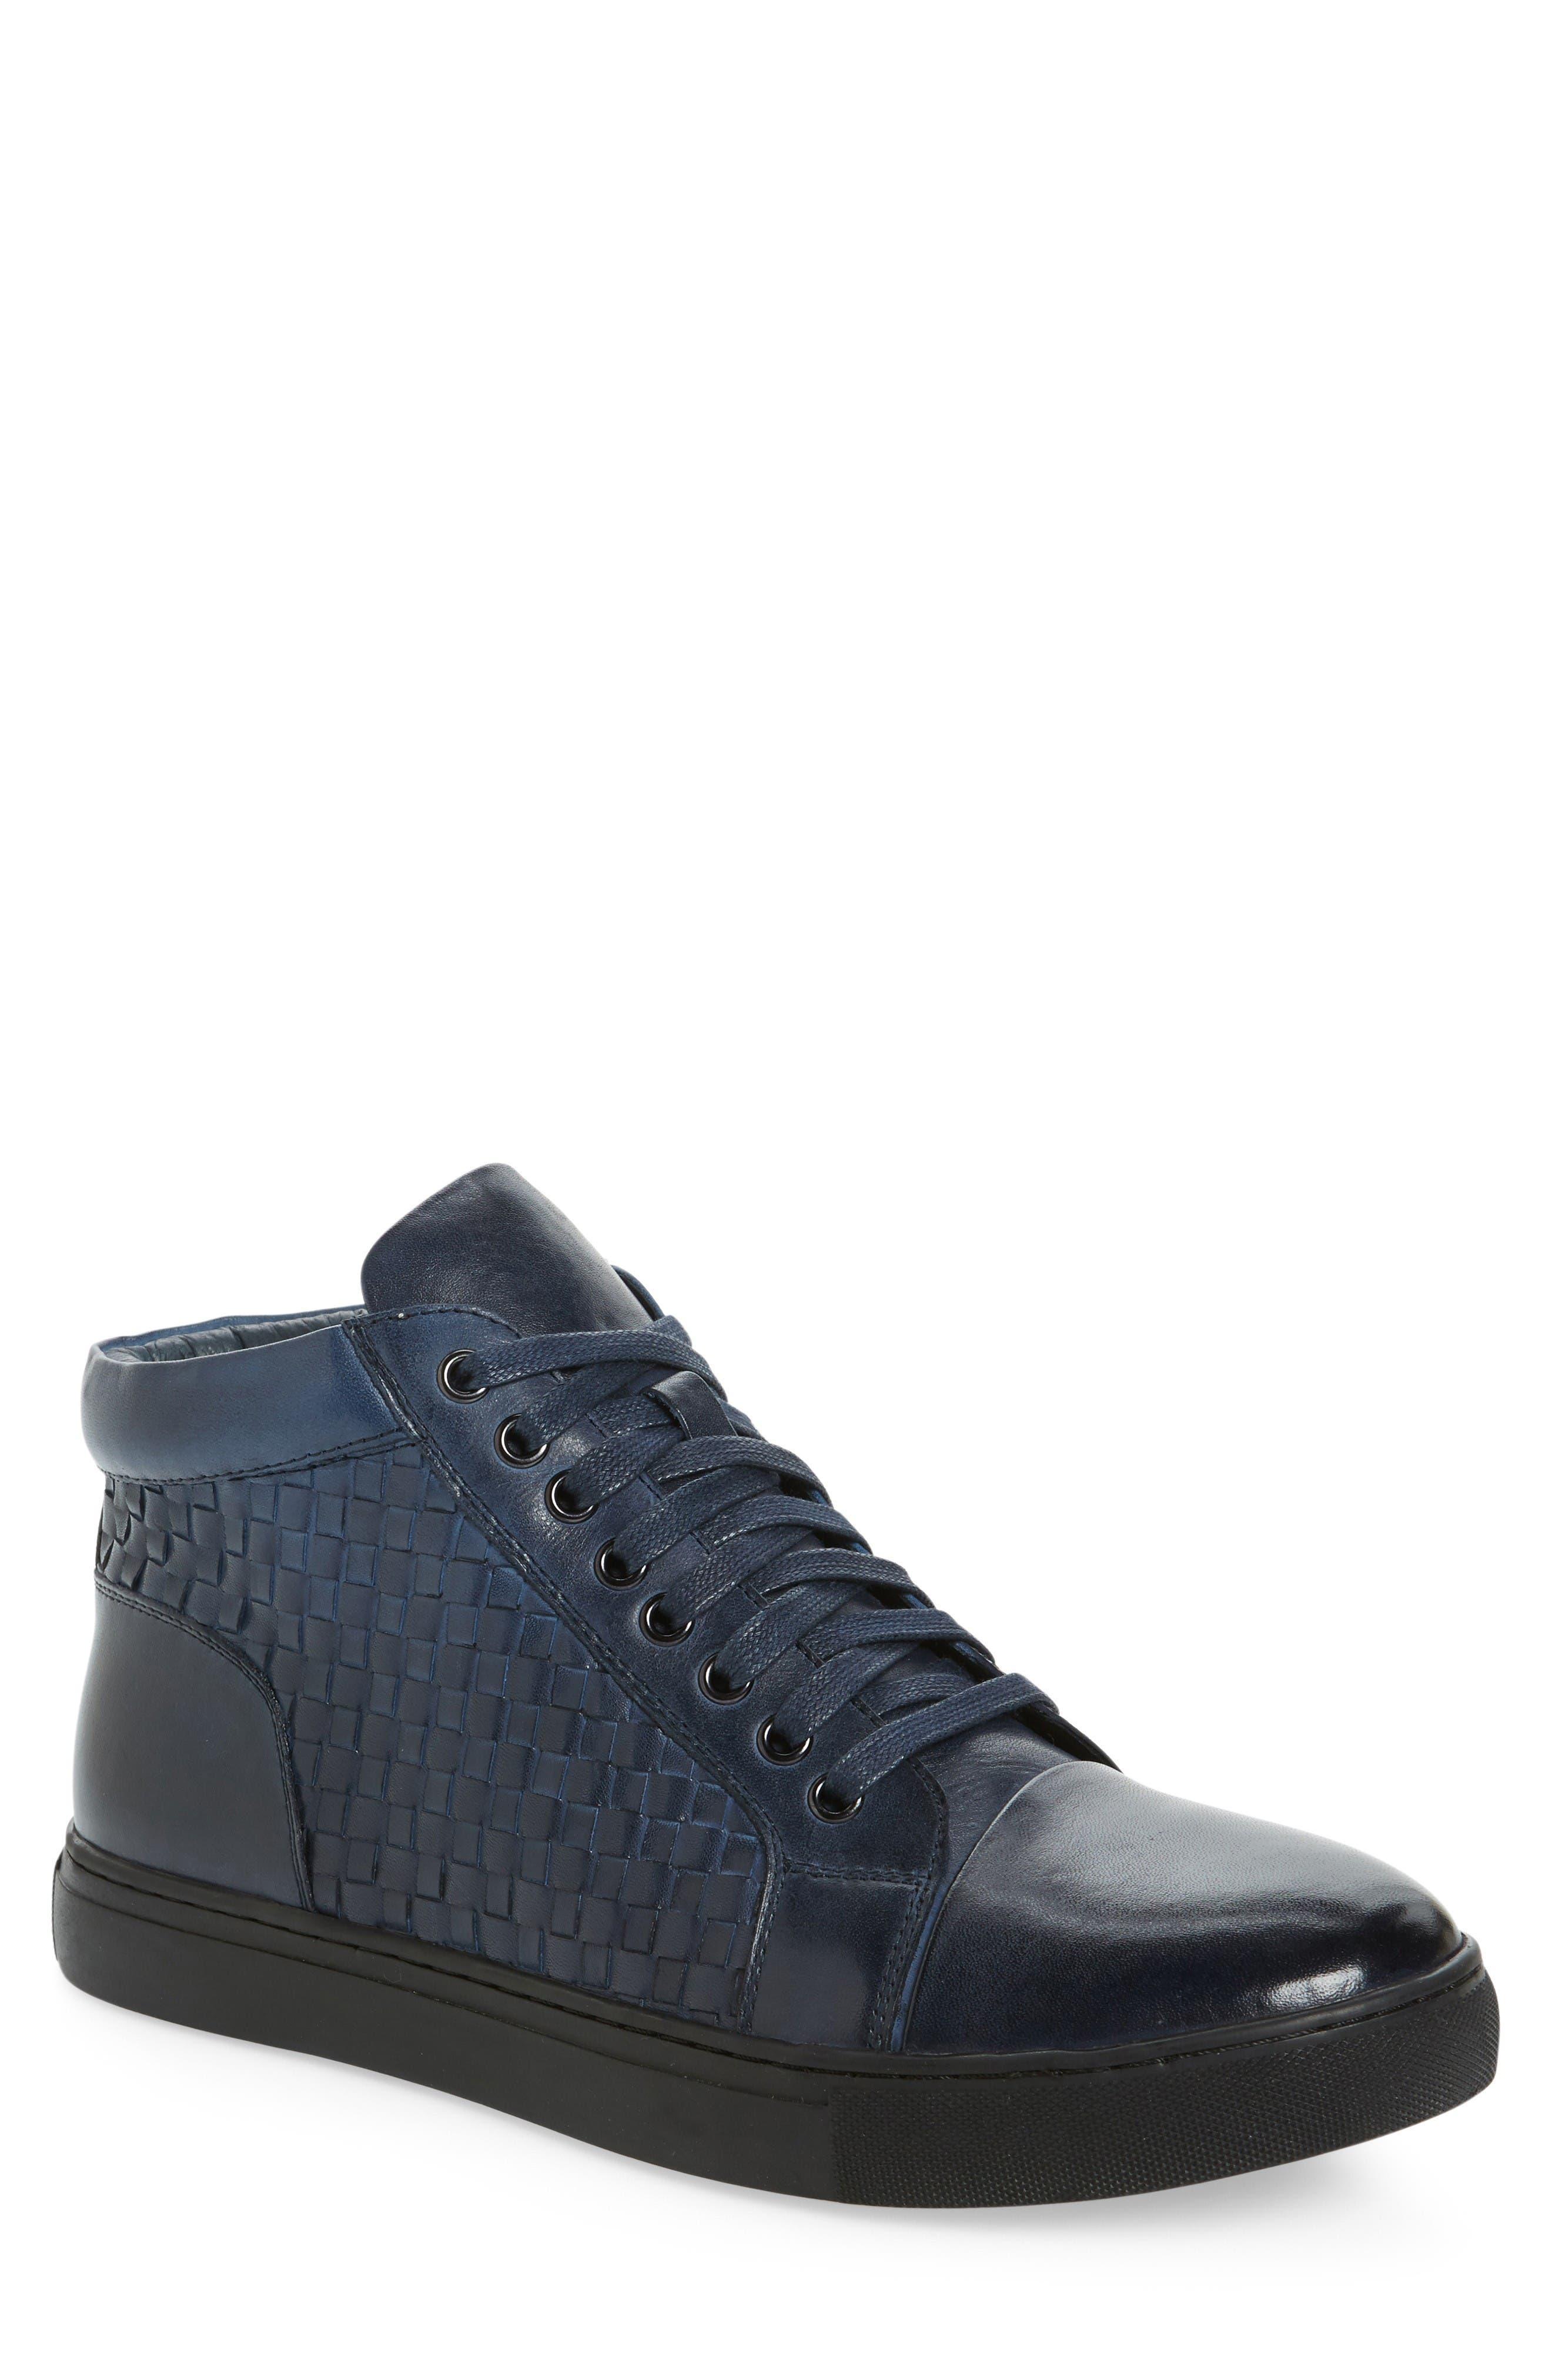 Zanzara Soul High Top Sneaker (Men)